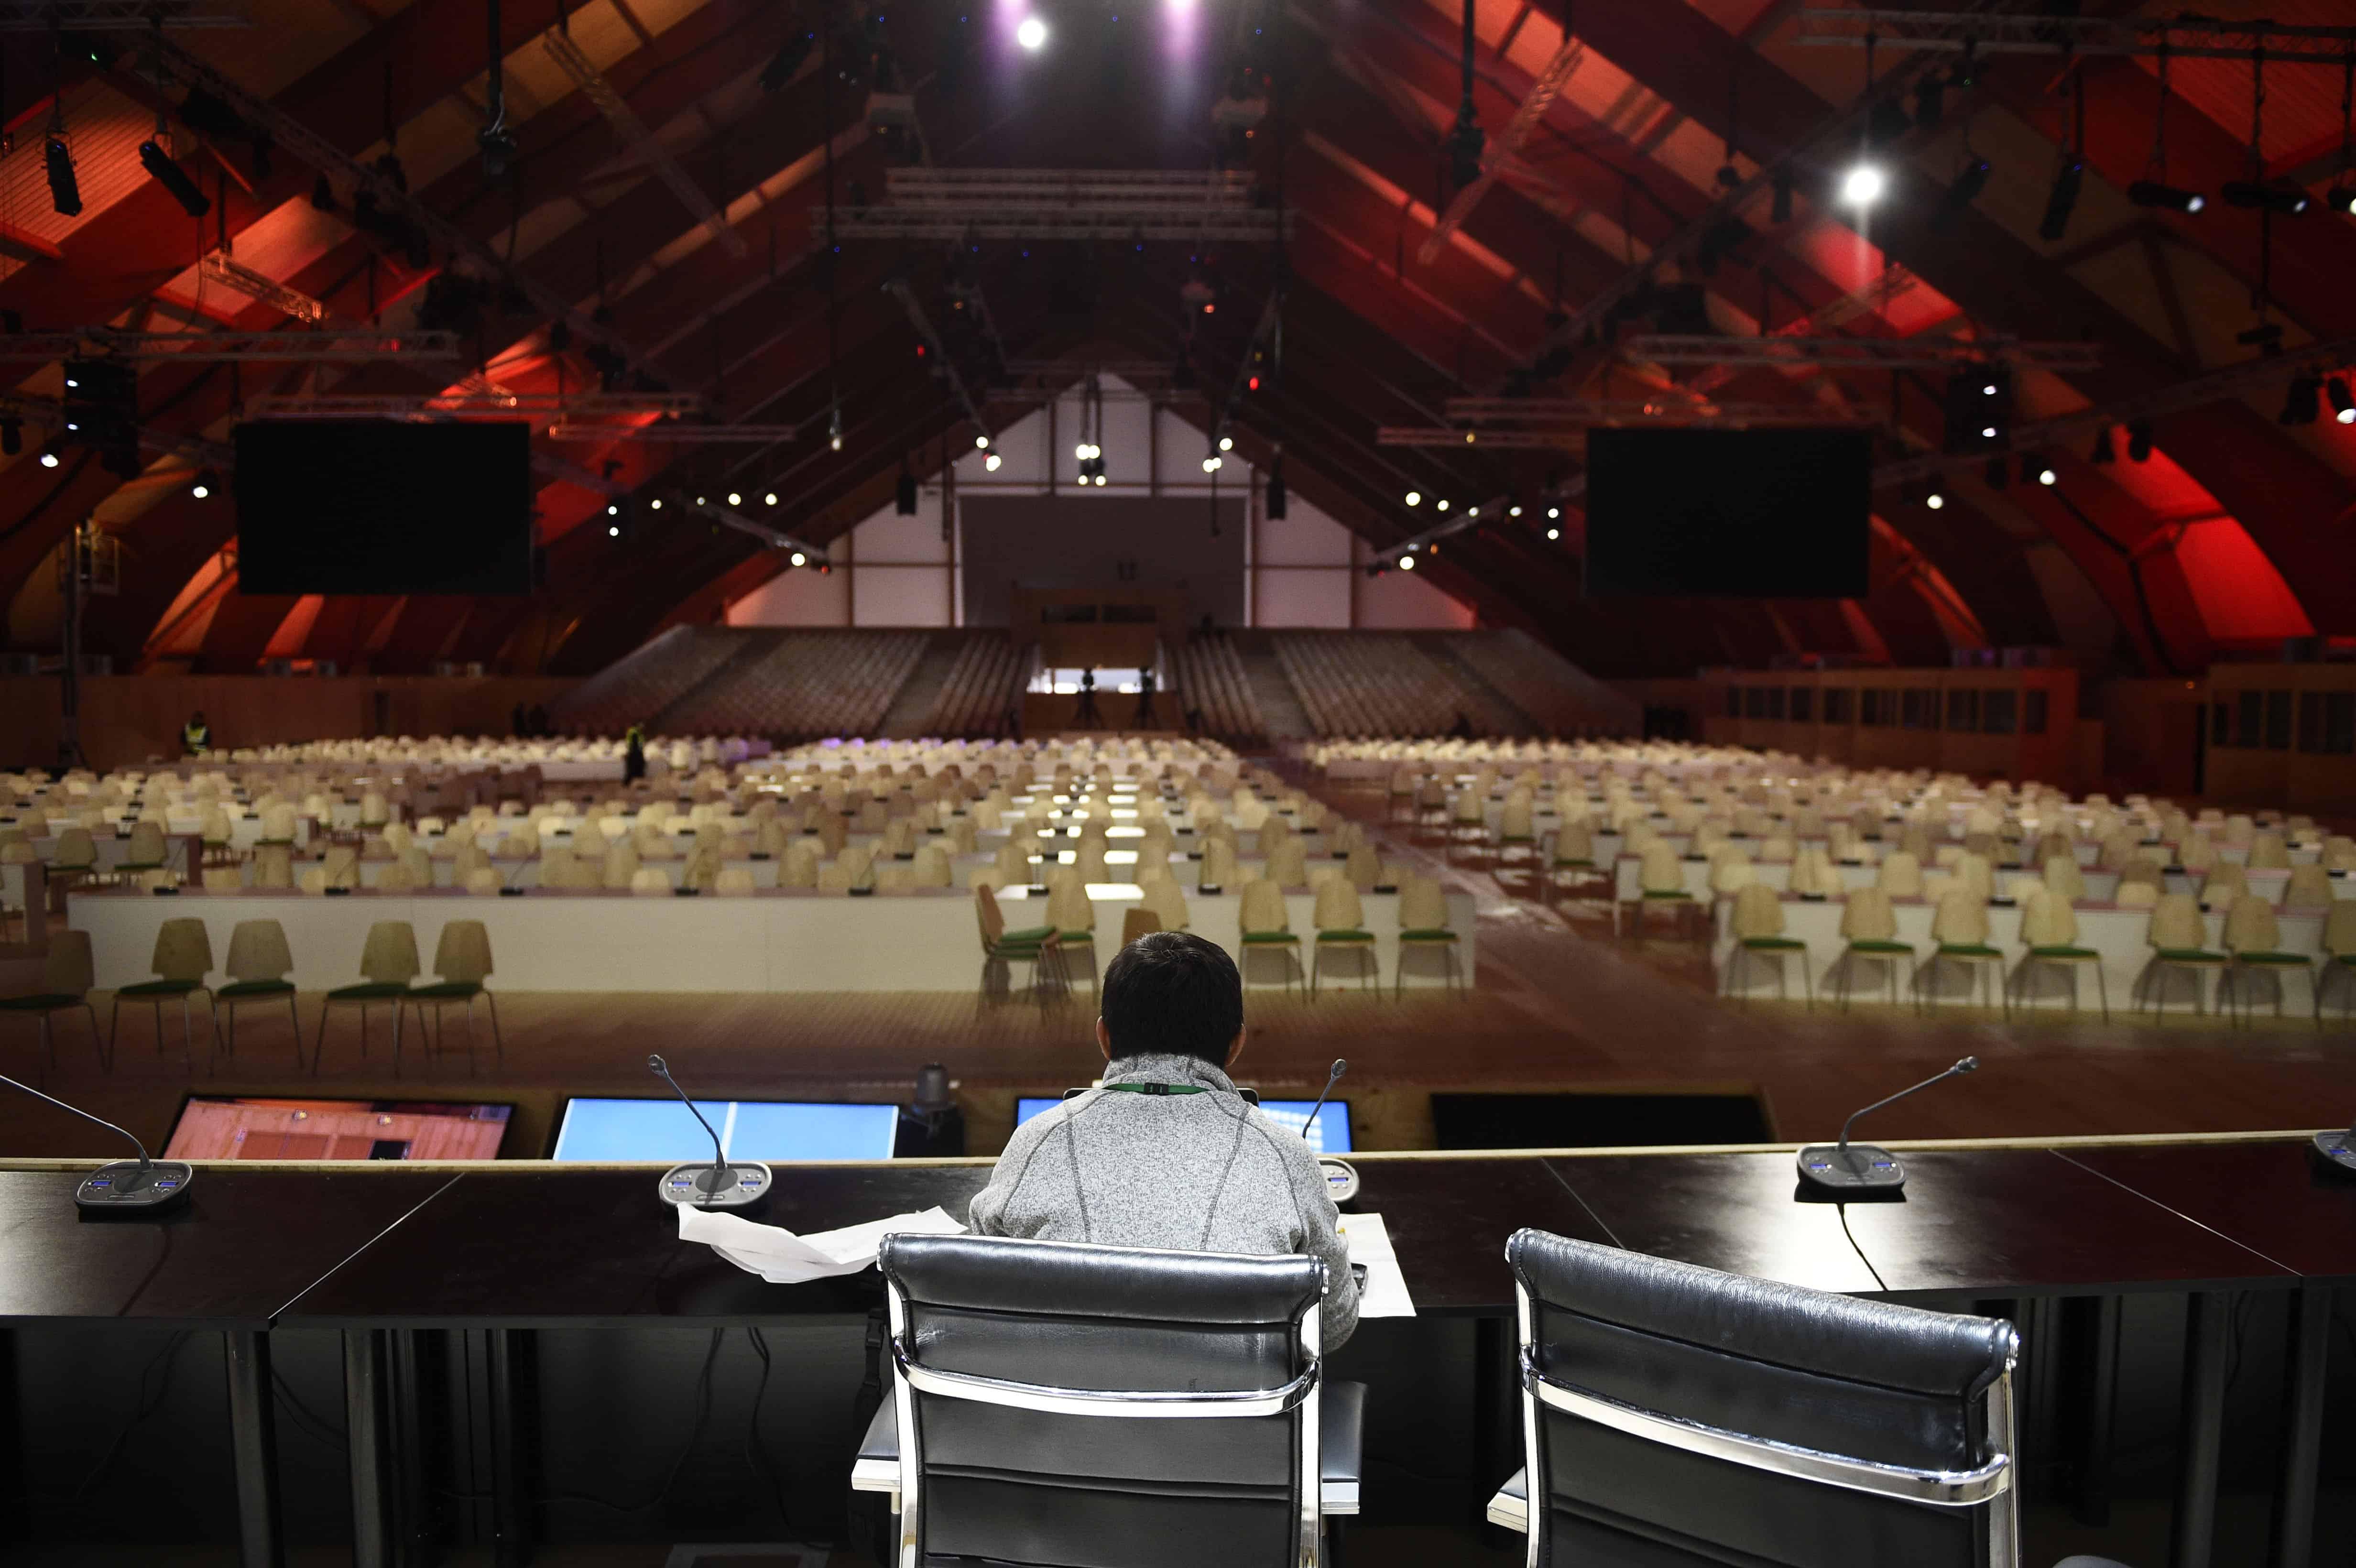 COP21 conference center, north of Paris